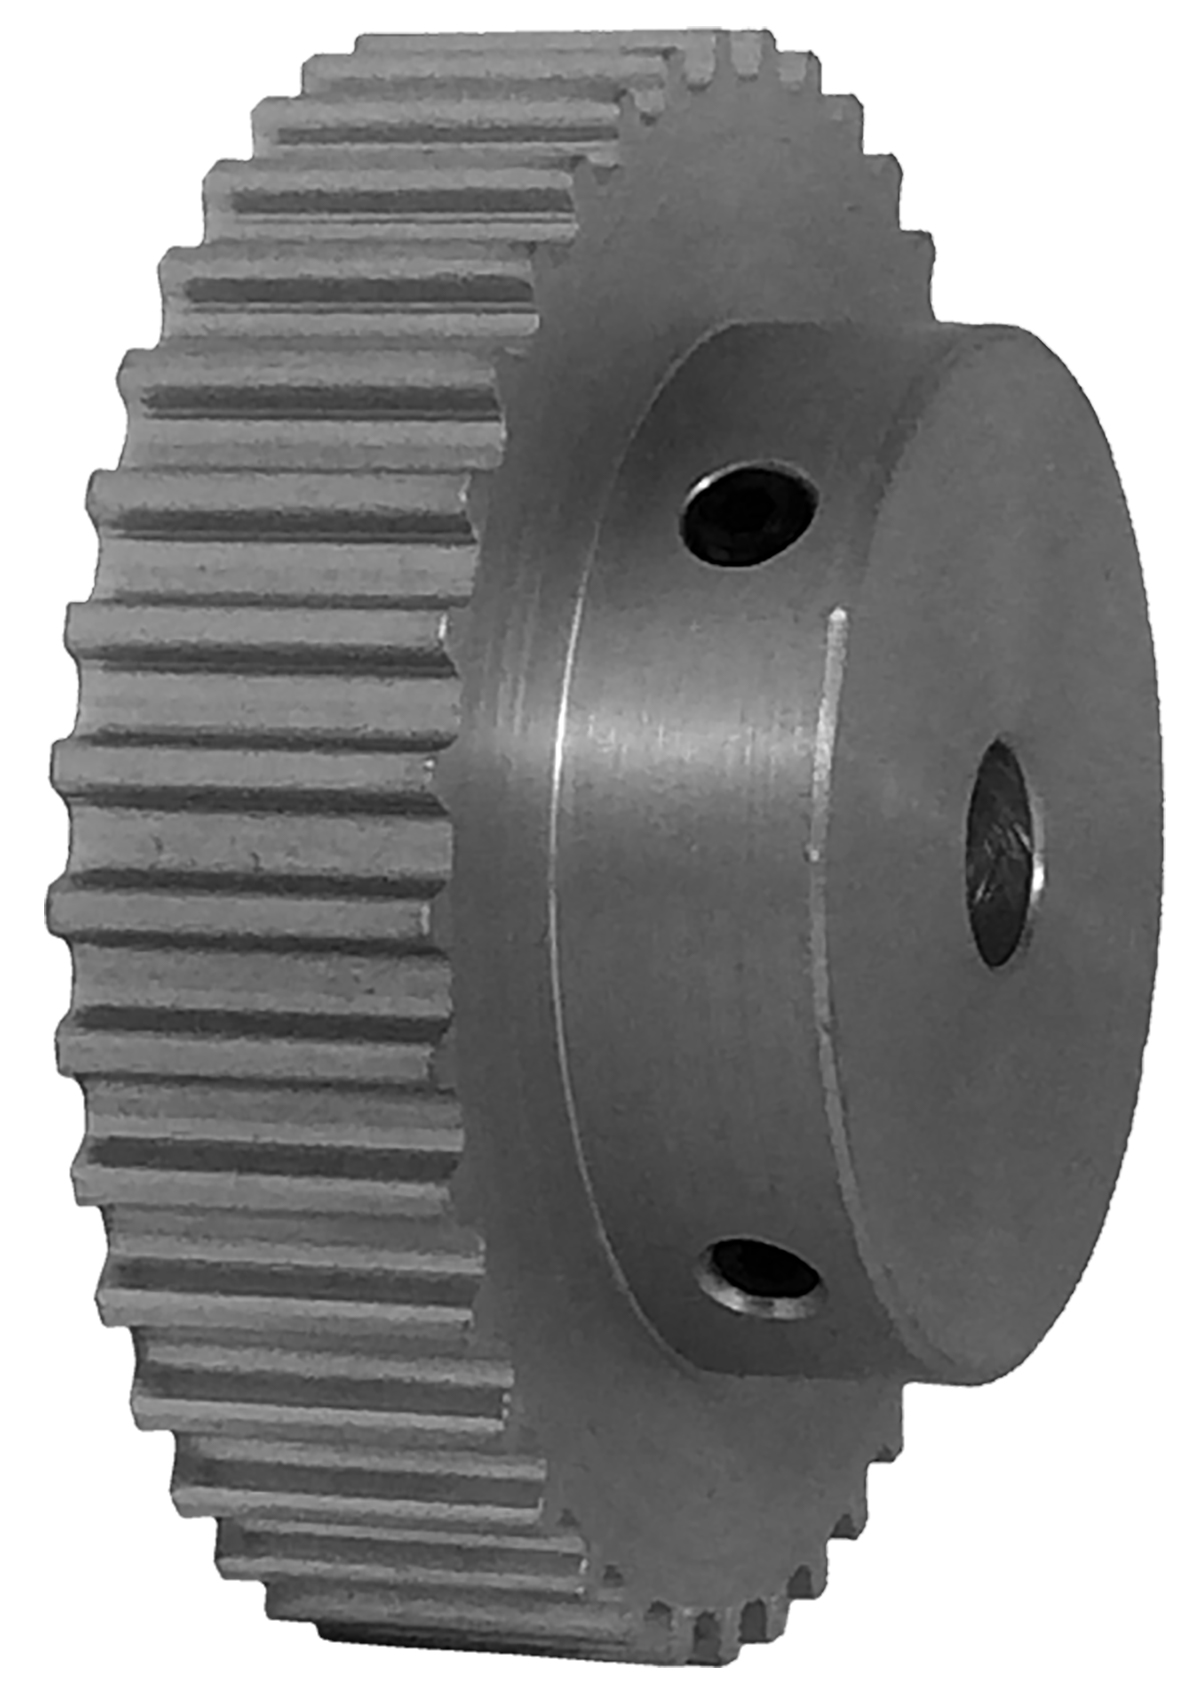 38-5M09-6A4 - Aluminum Powerhouse®HTD® Pulleys